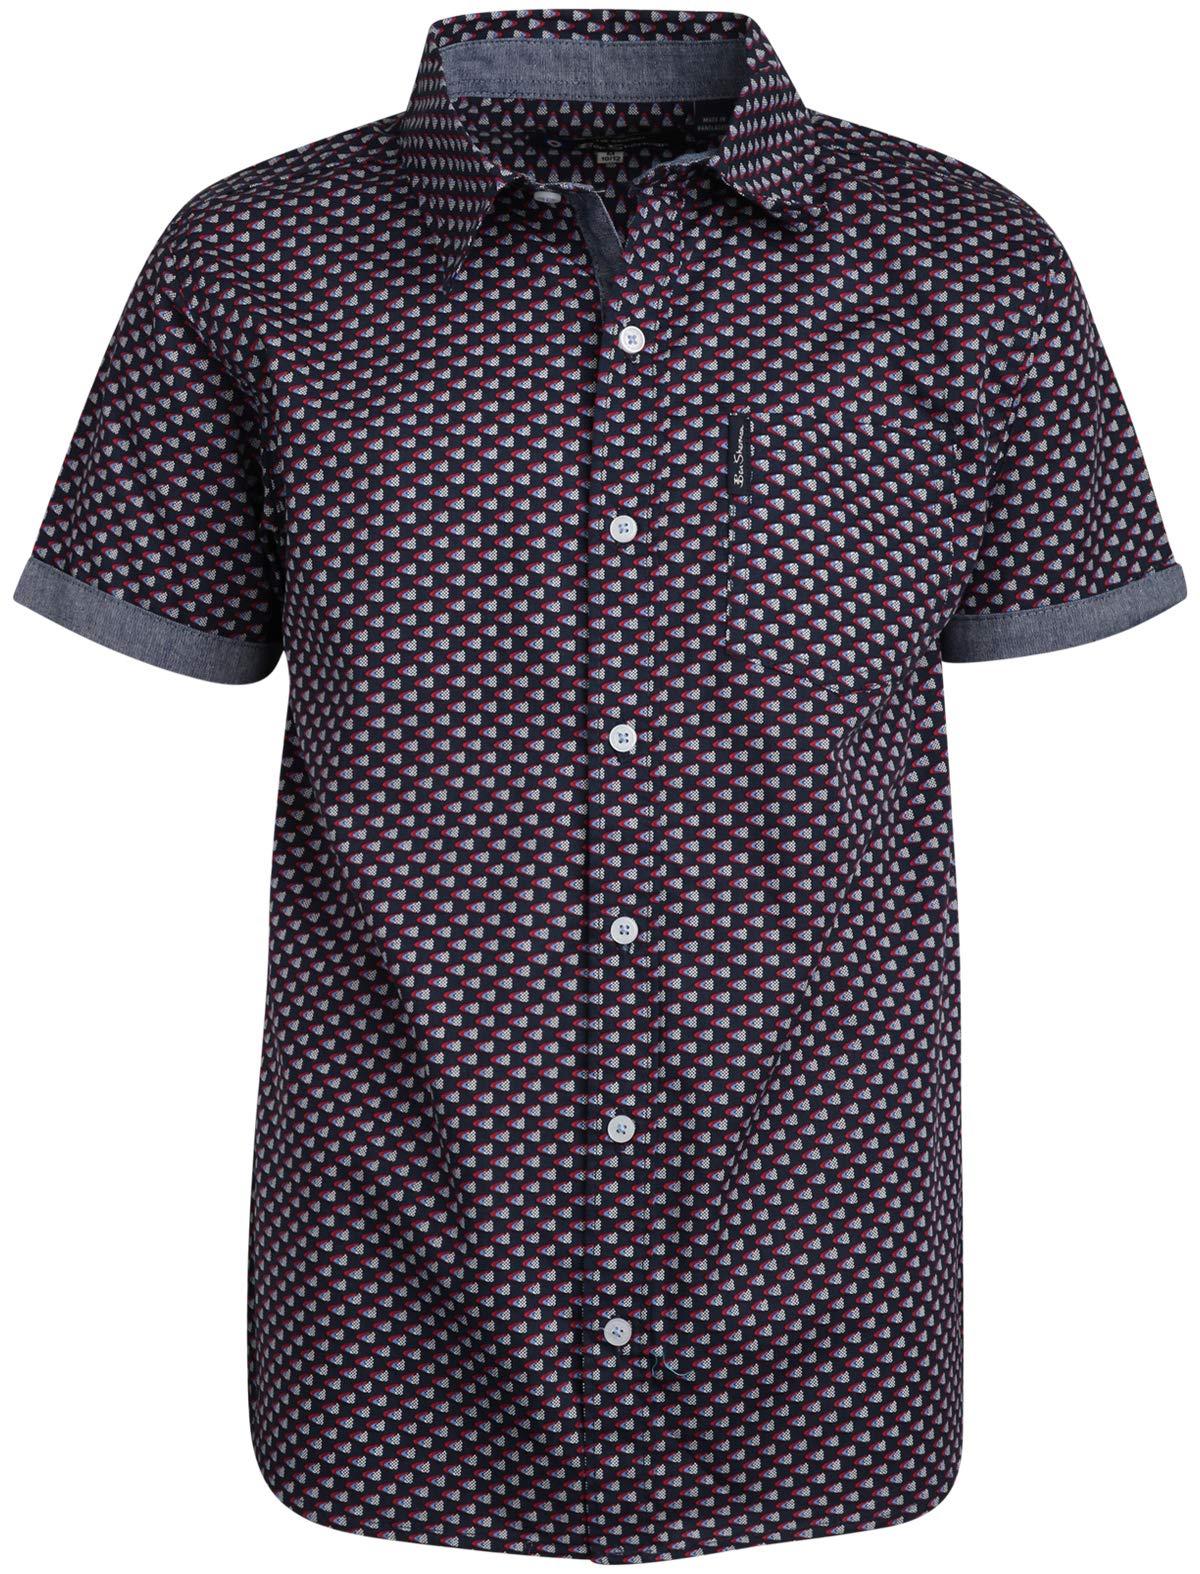 Ben Sherman Boys Short Sleeve Button Down Shirt (Navy/Pattern, 10/12)'